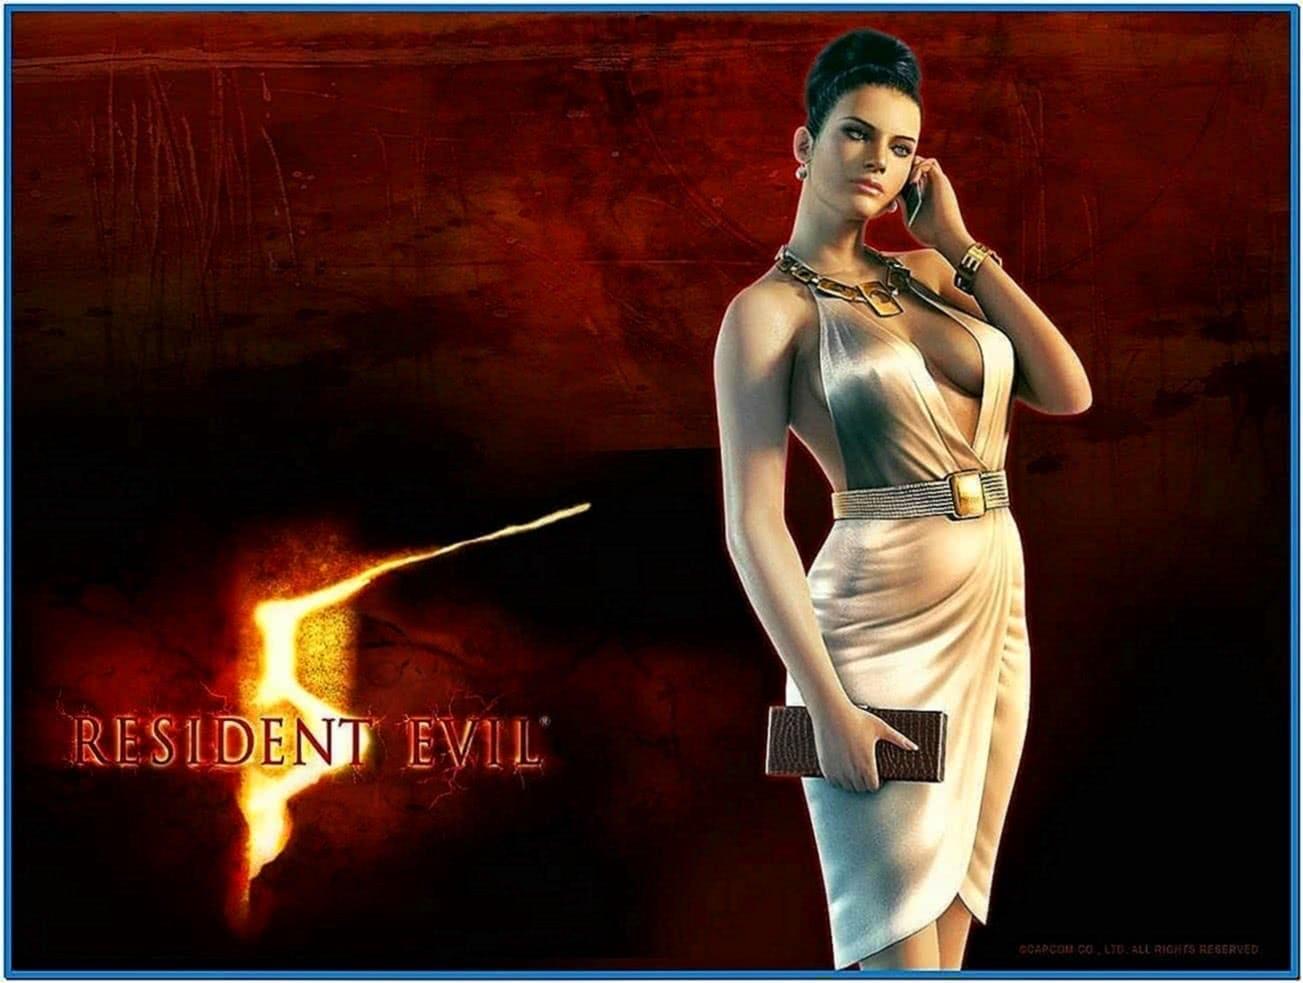 Resident Evil 5 Screensaver Download Free